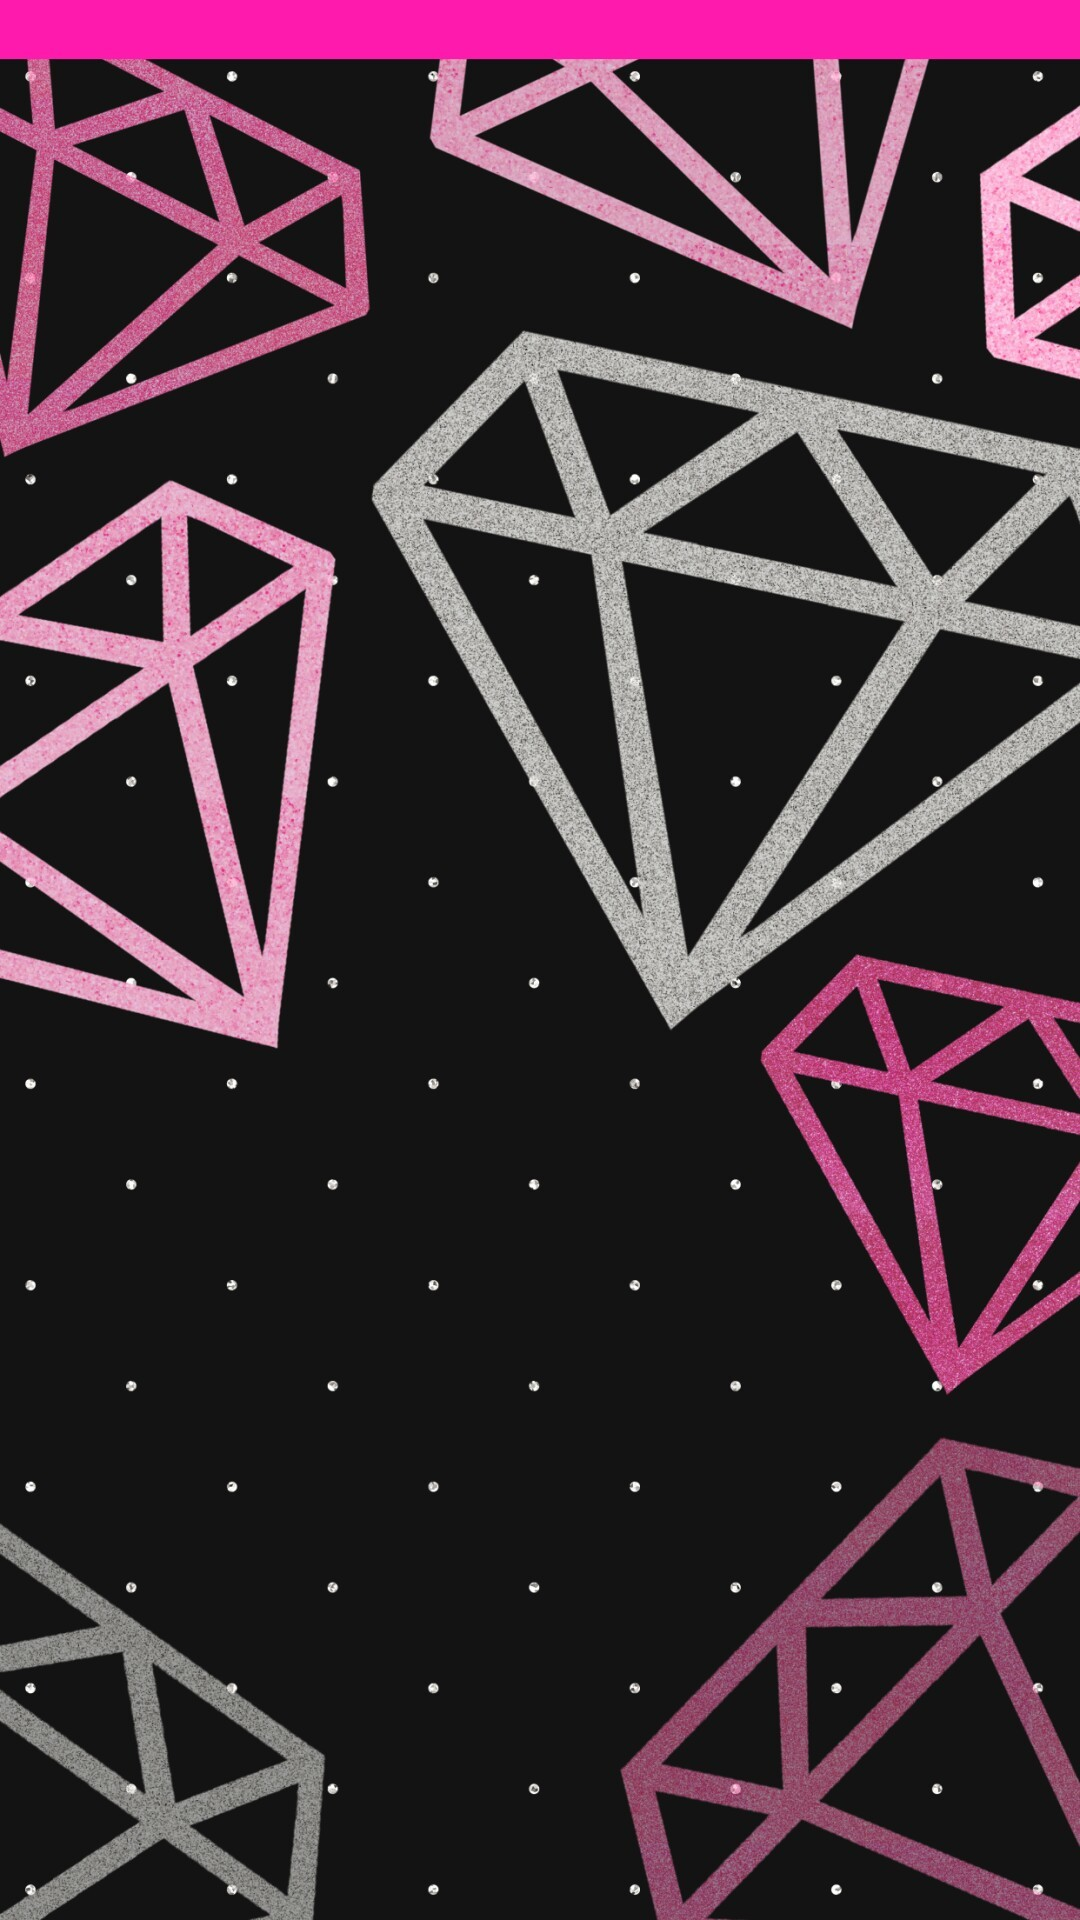 Pink Diamonds Wallpaper 69 Images